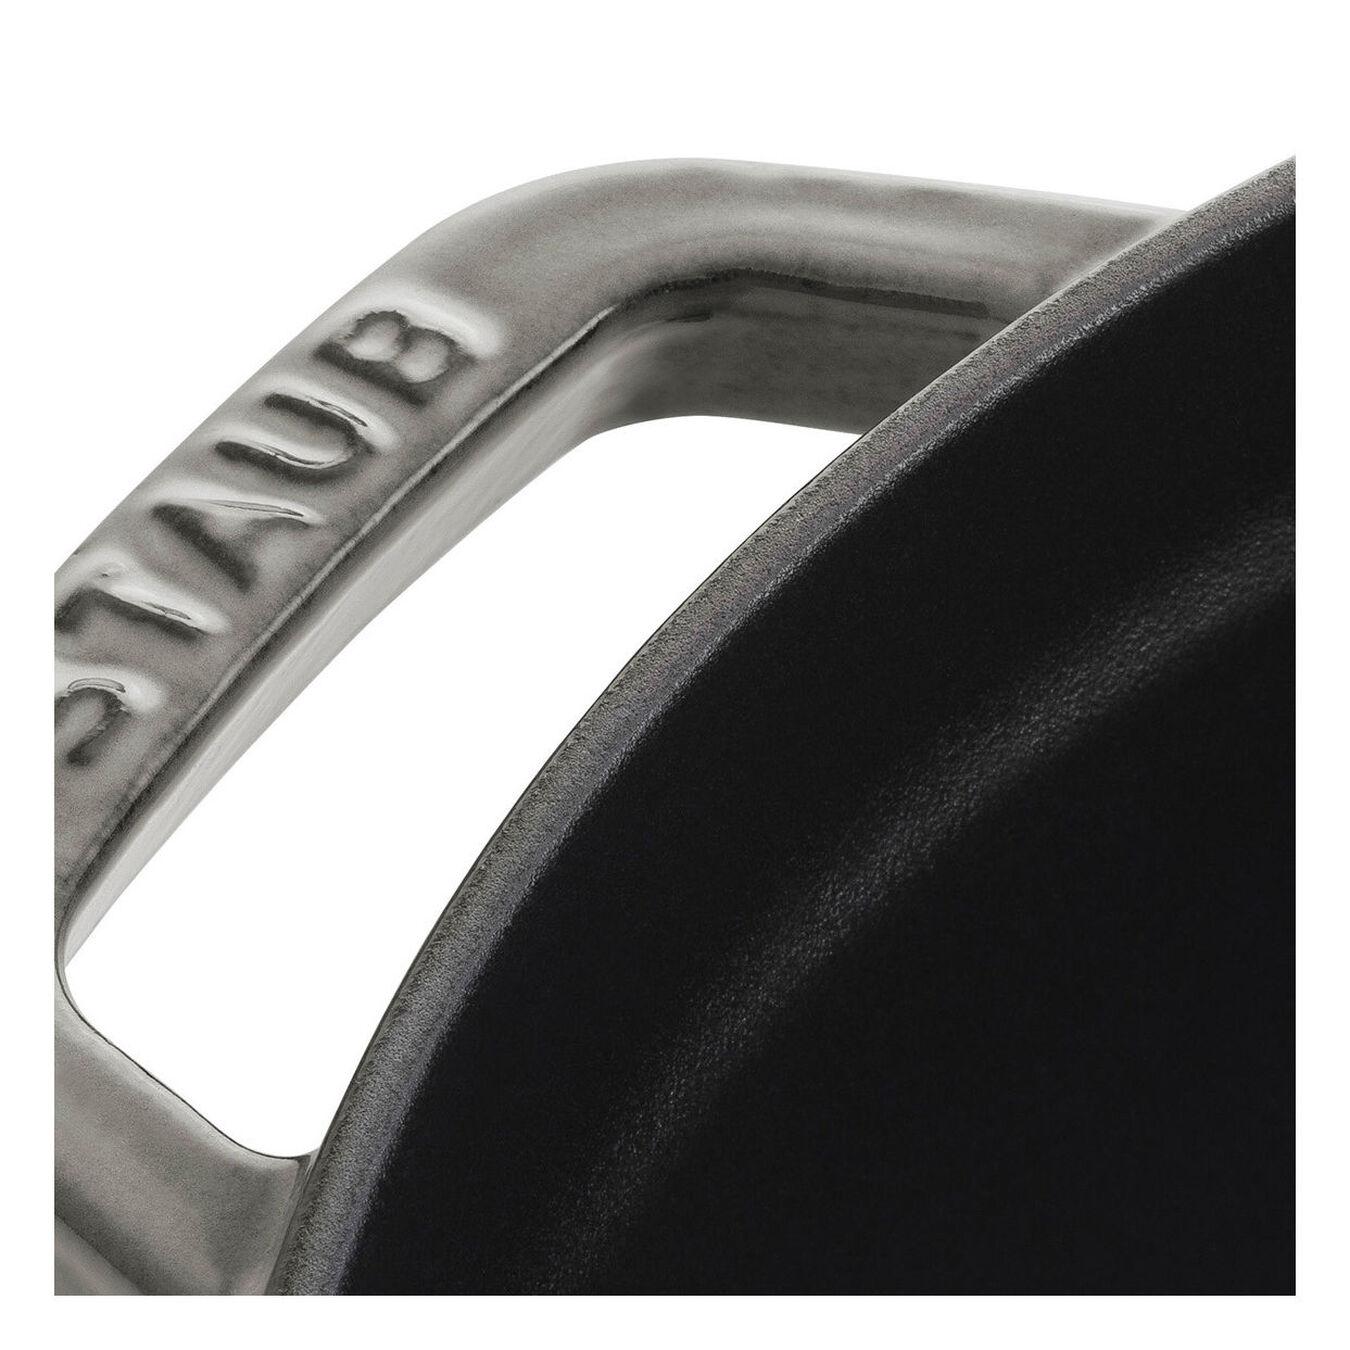 Cocotte rotonda - 20 cm, Colore grigio grafite,,large 3